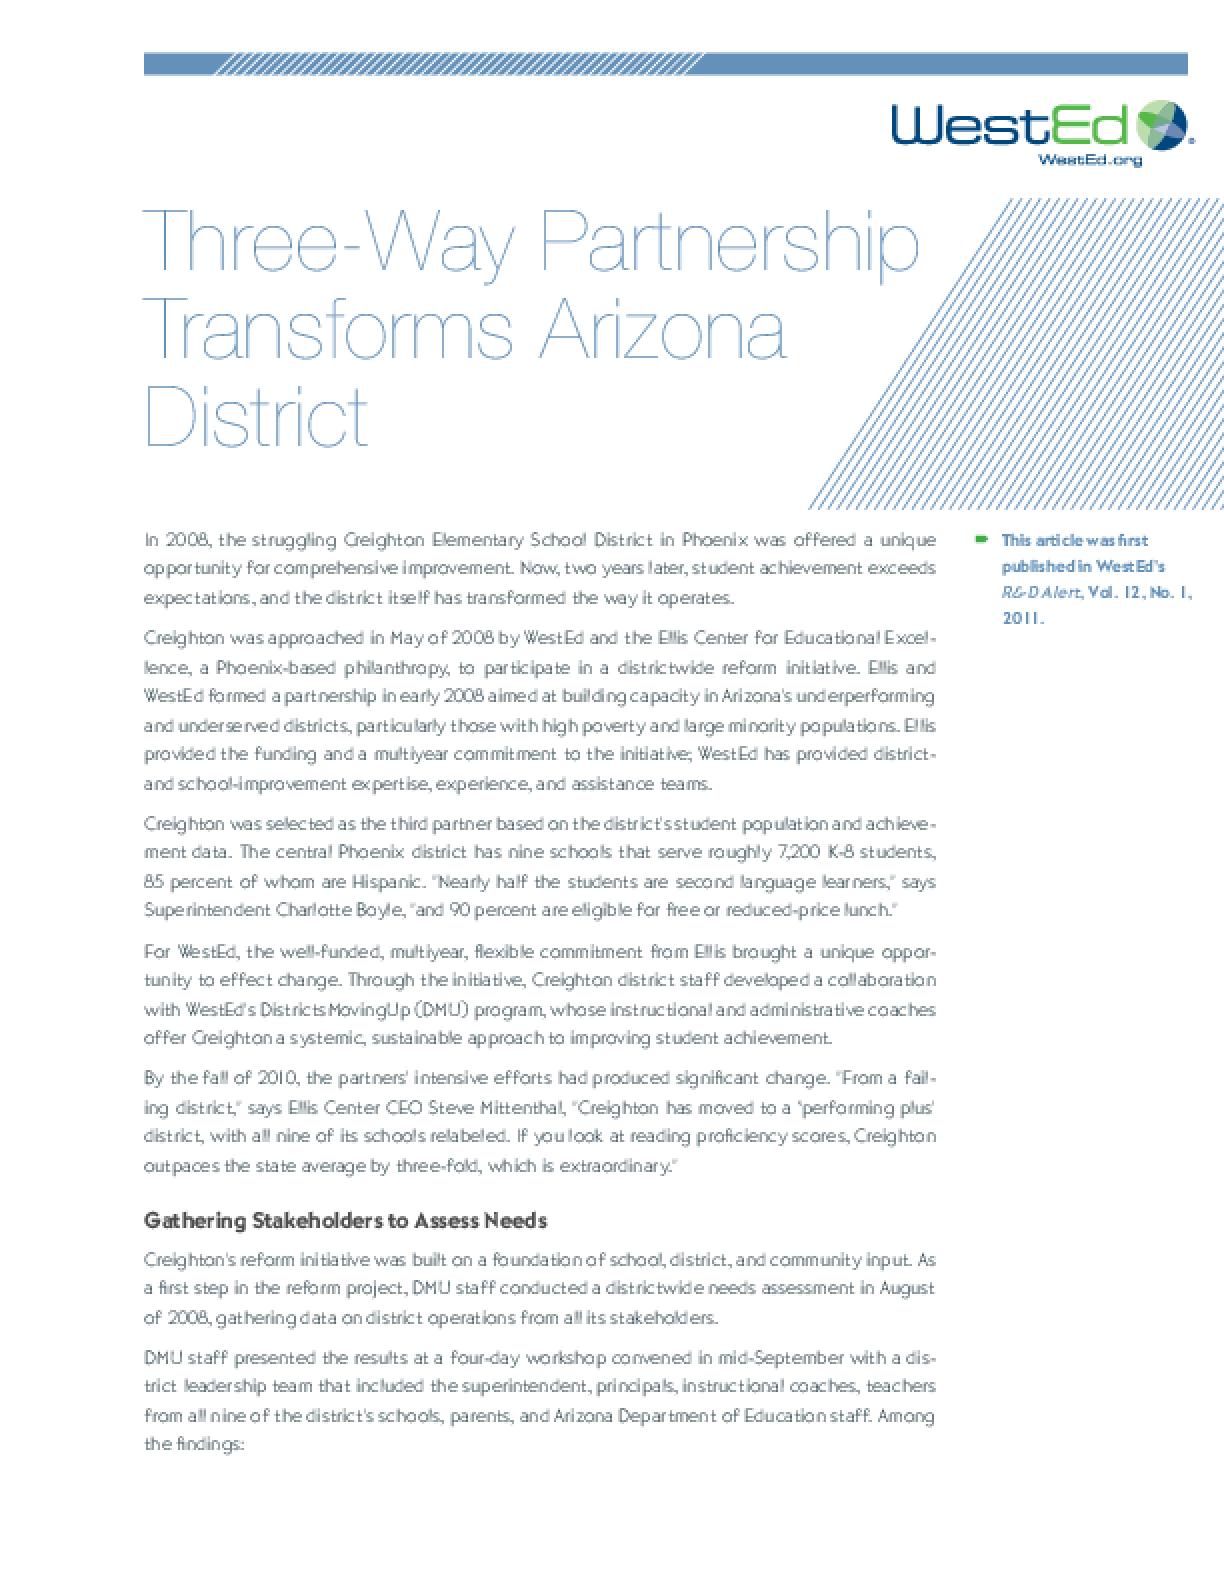 Three-Way Partnership Transforms Arizona District